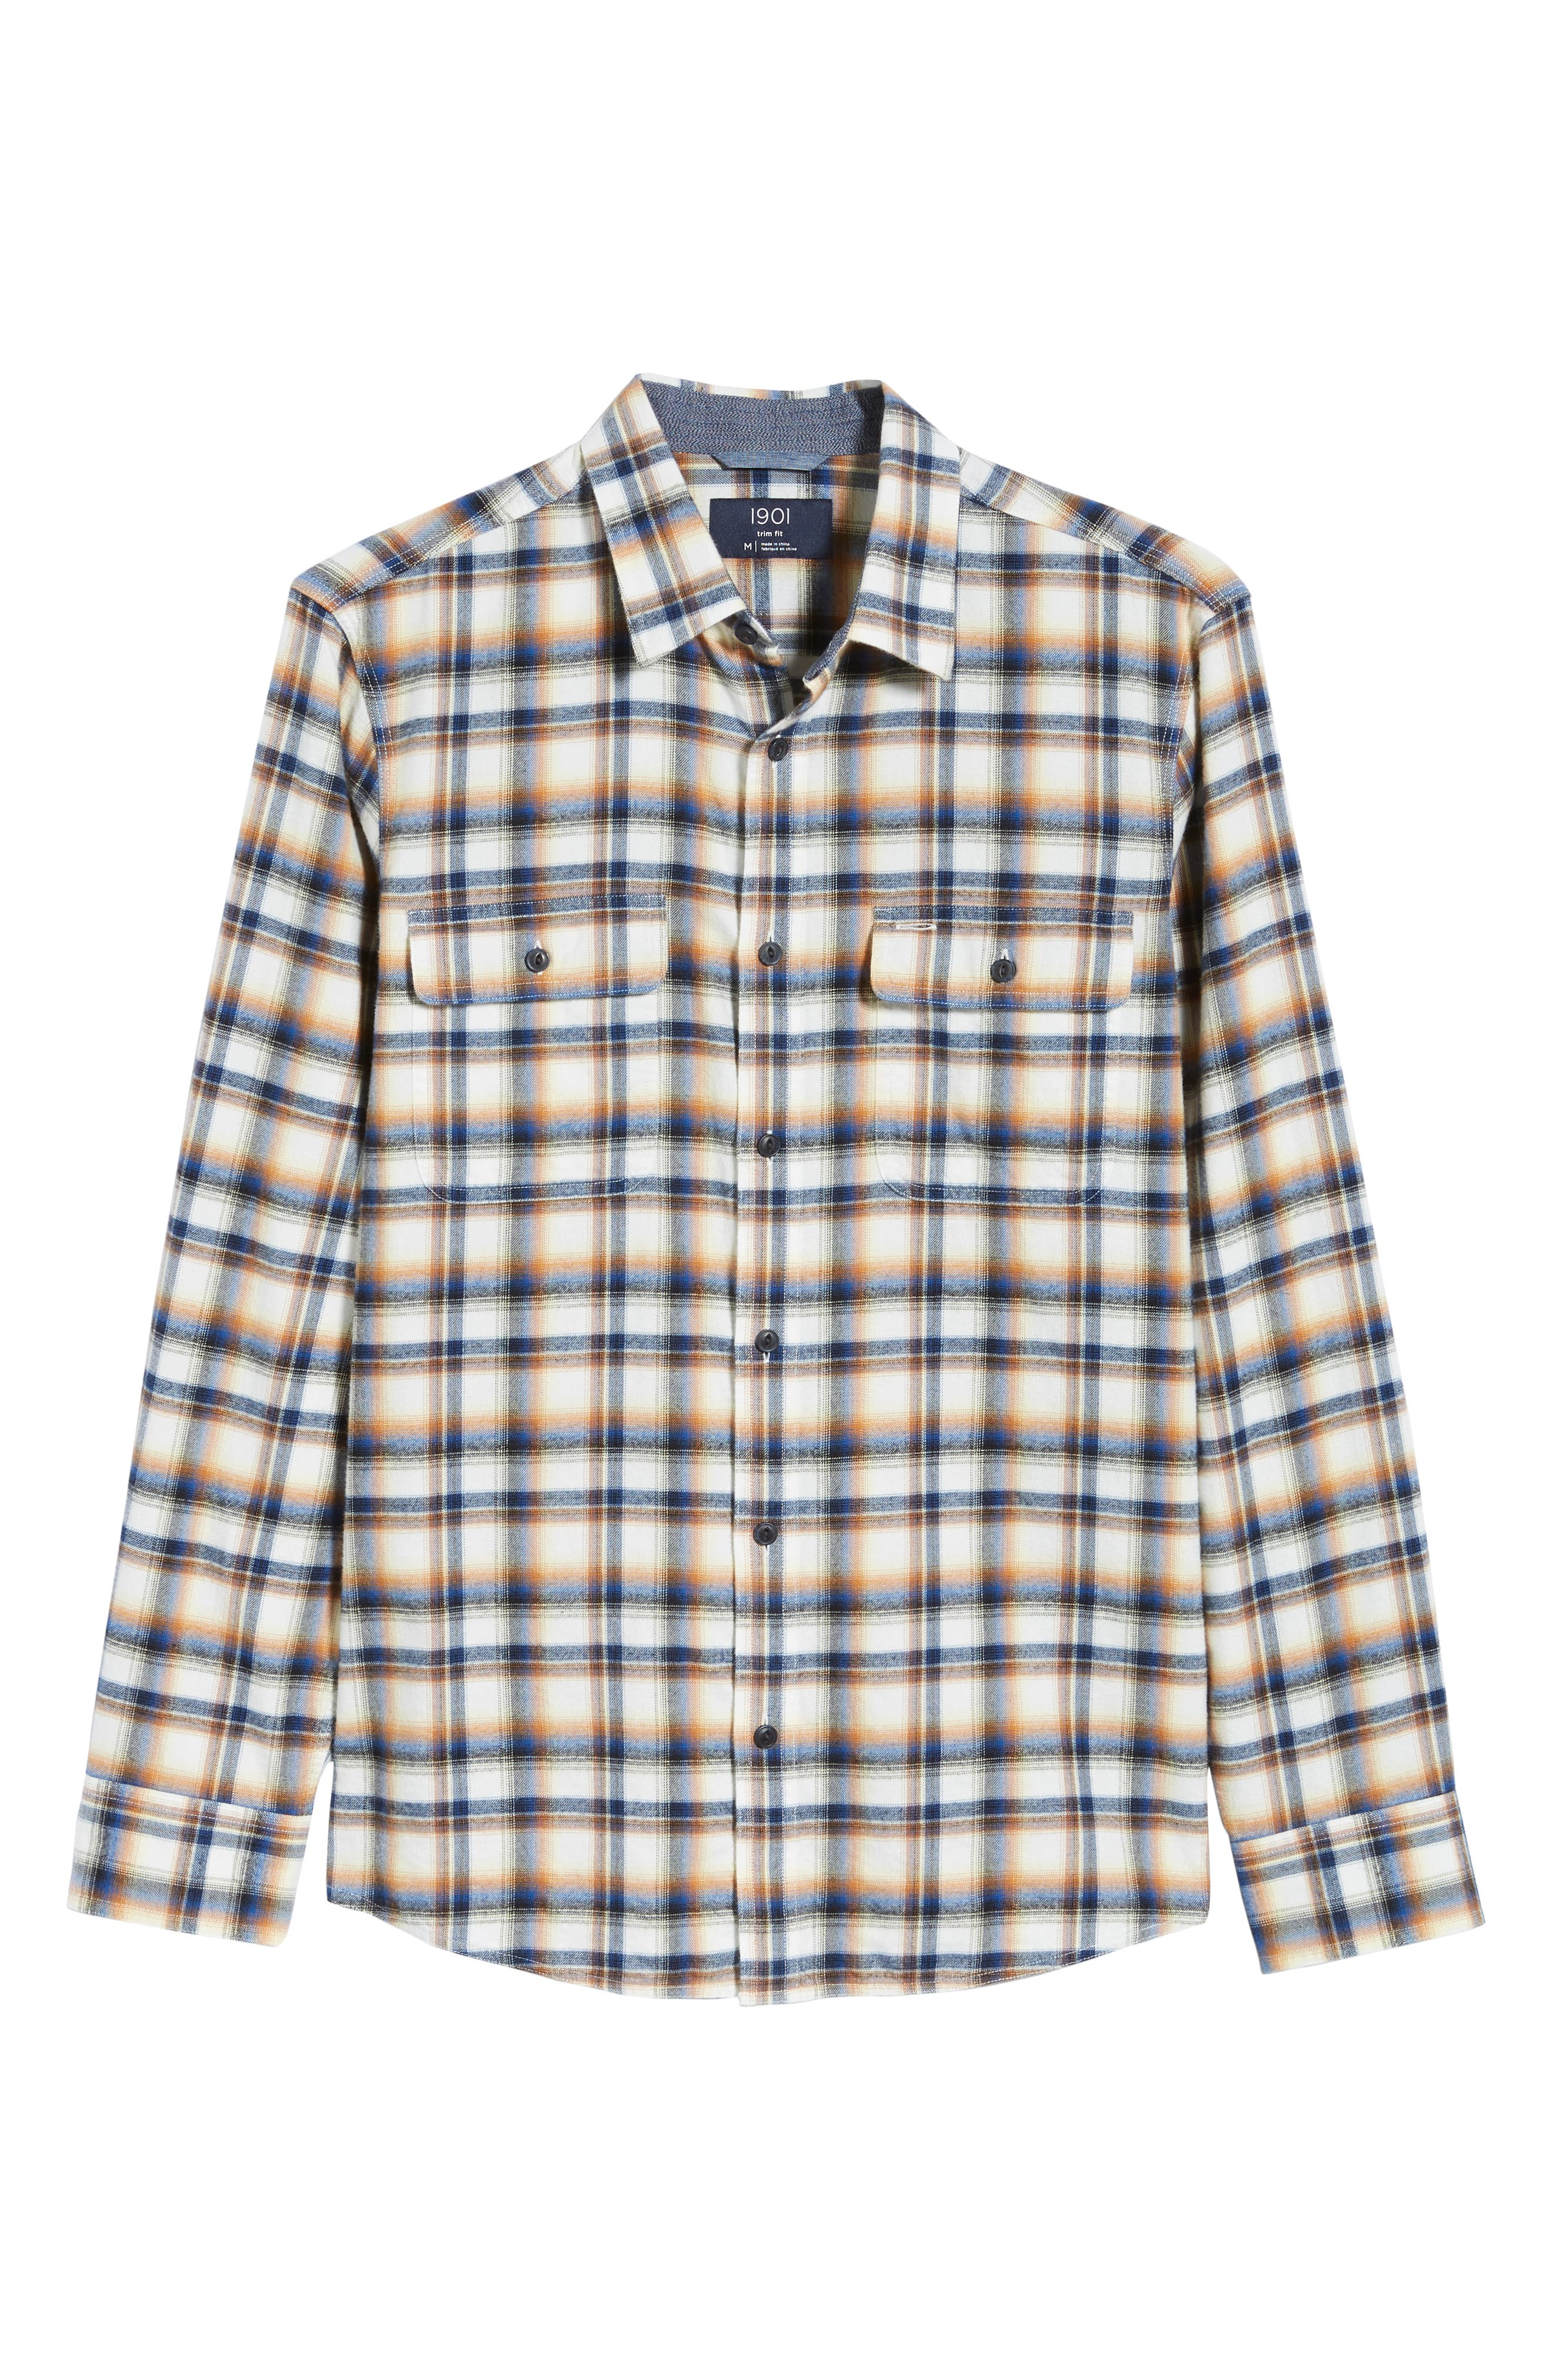 Trim Fit Trucker Plaid Sport Shirt,                             Alternate thumbnail 5, color,                             IVORY BLUE ORANGE PLAID